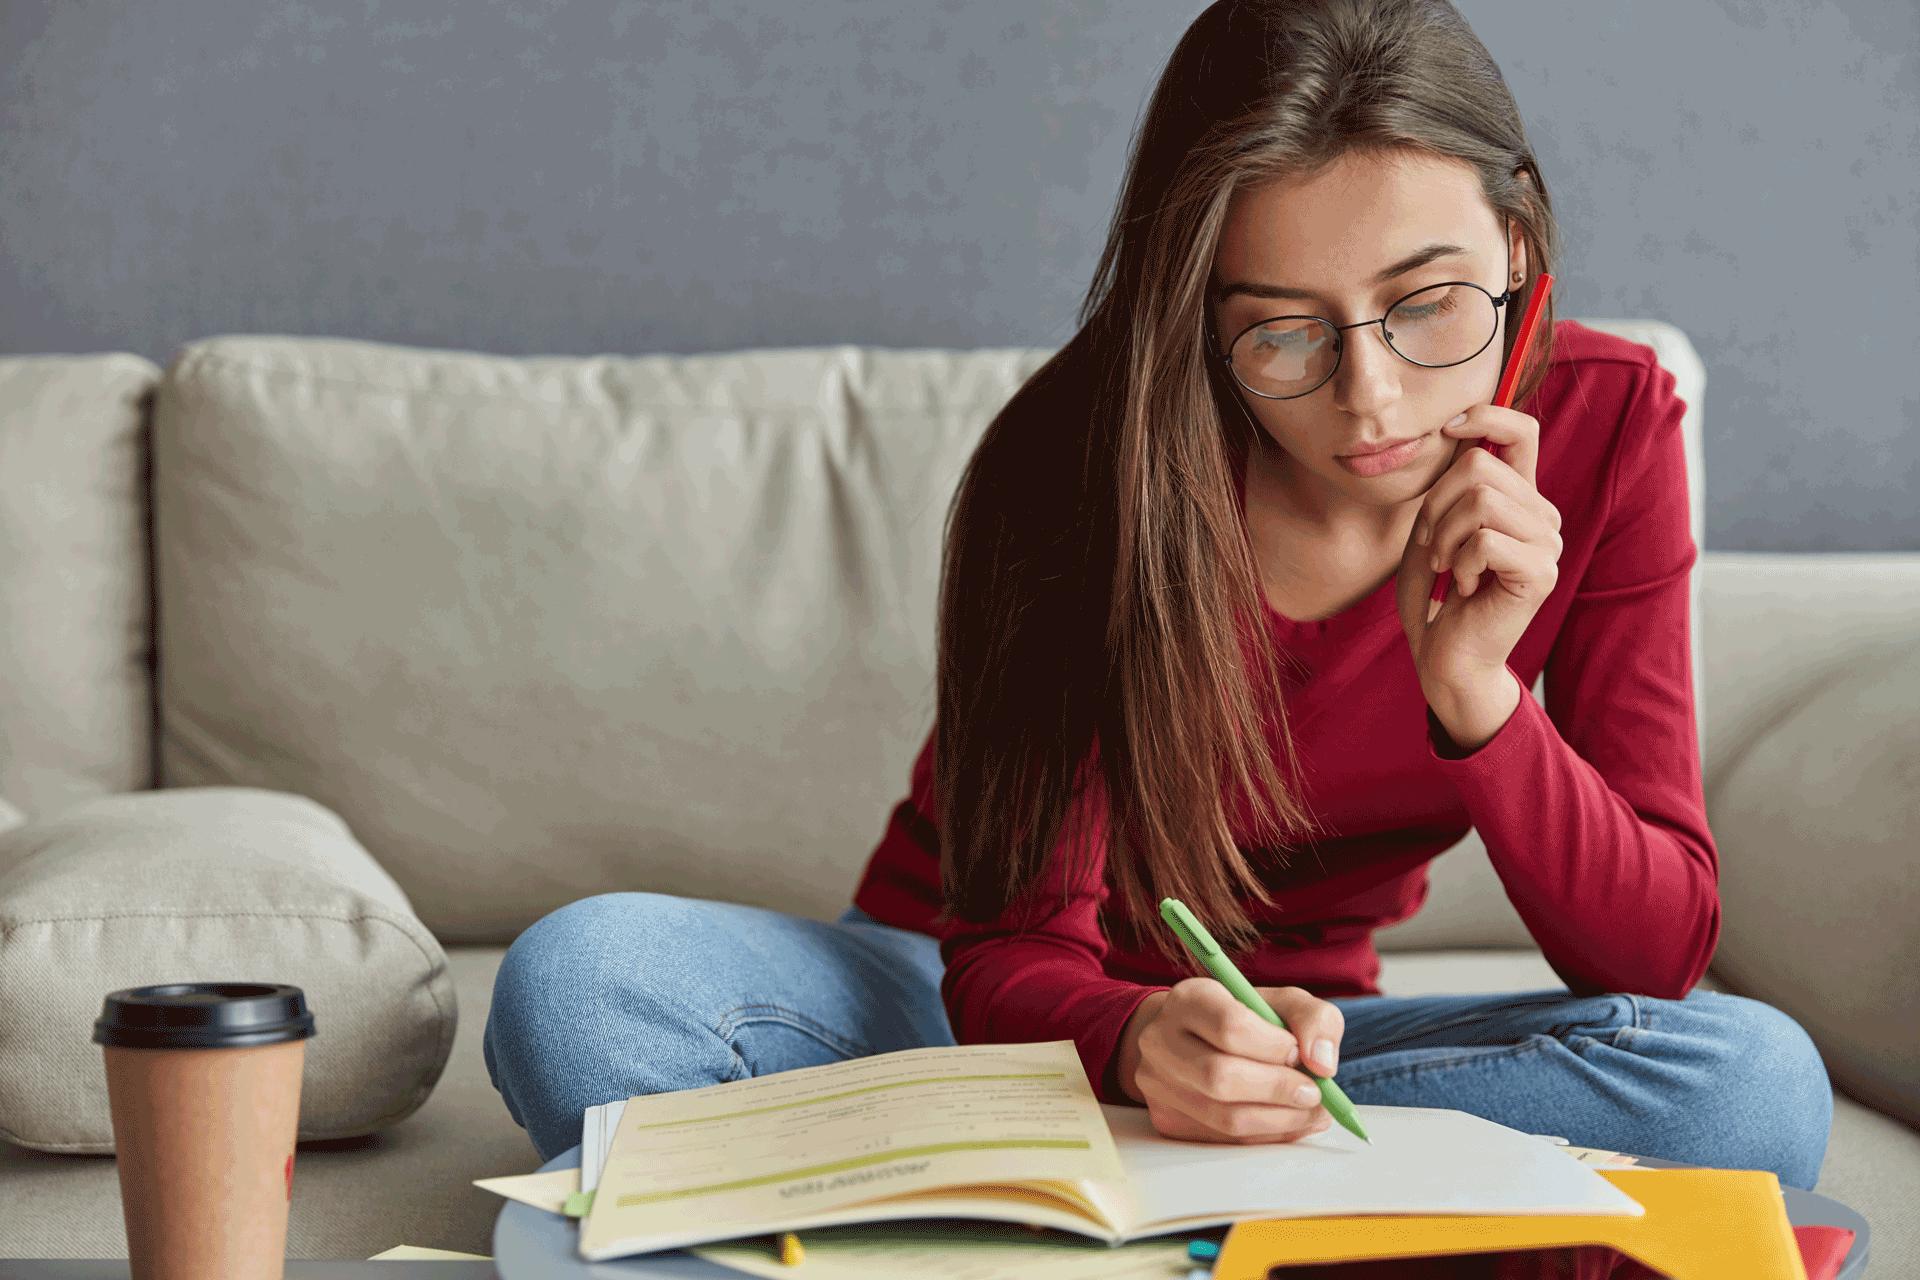 young women using her writing skills